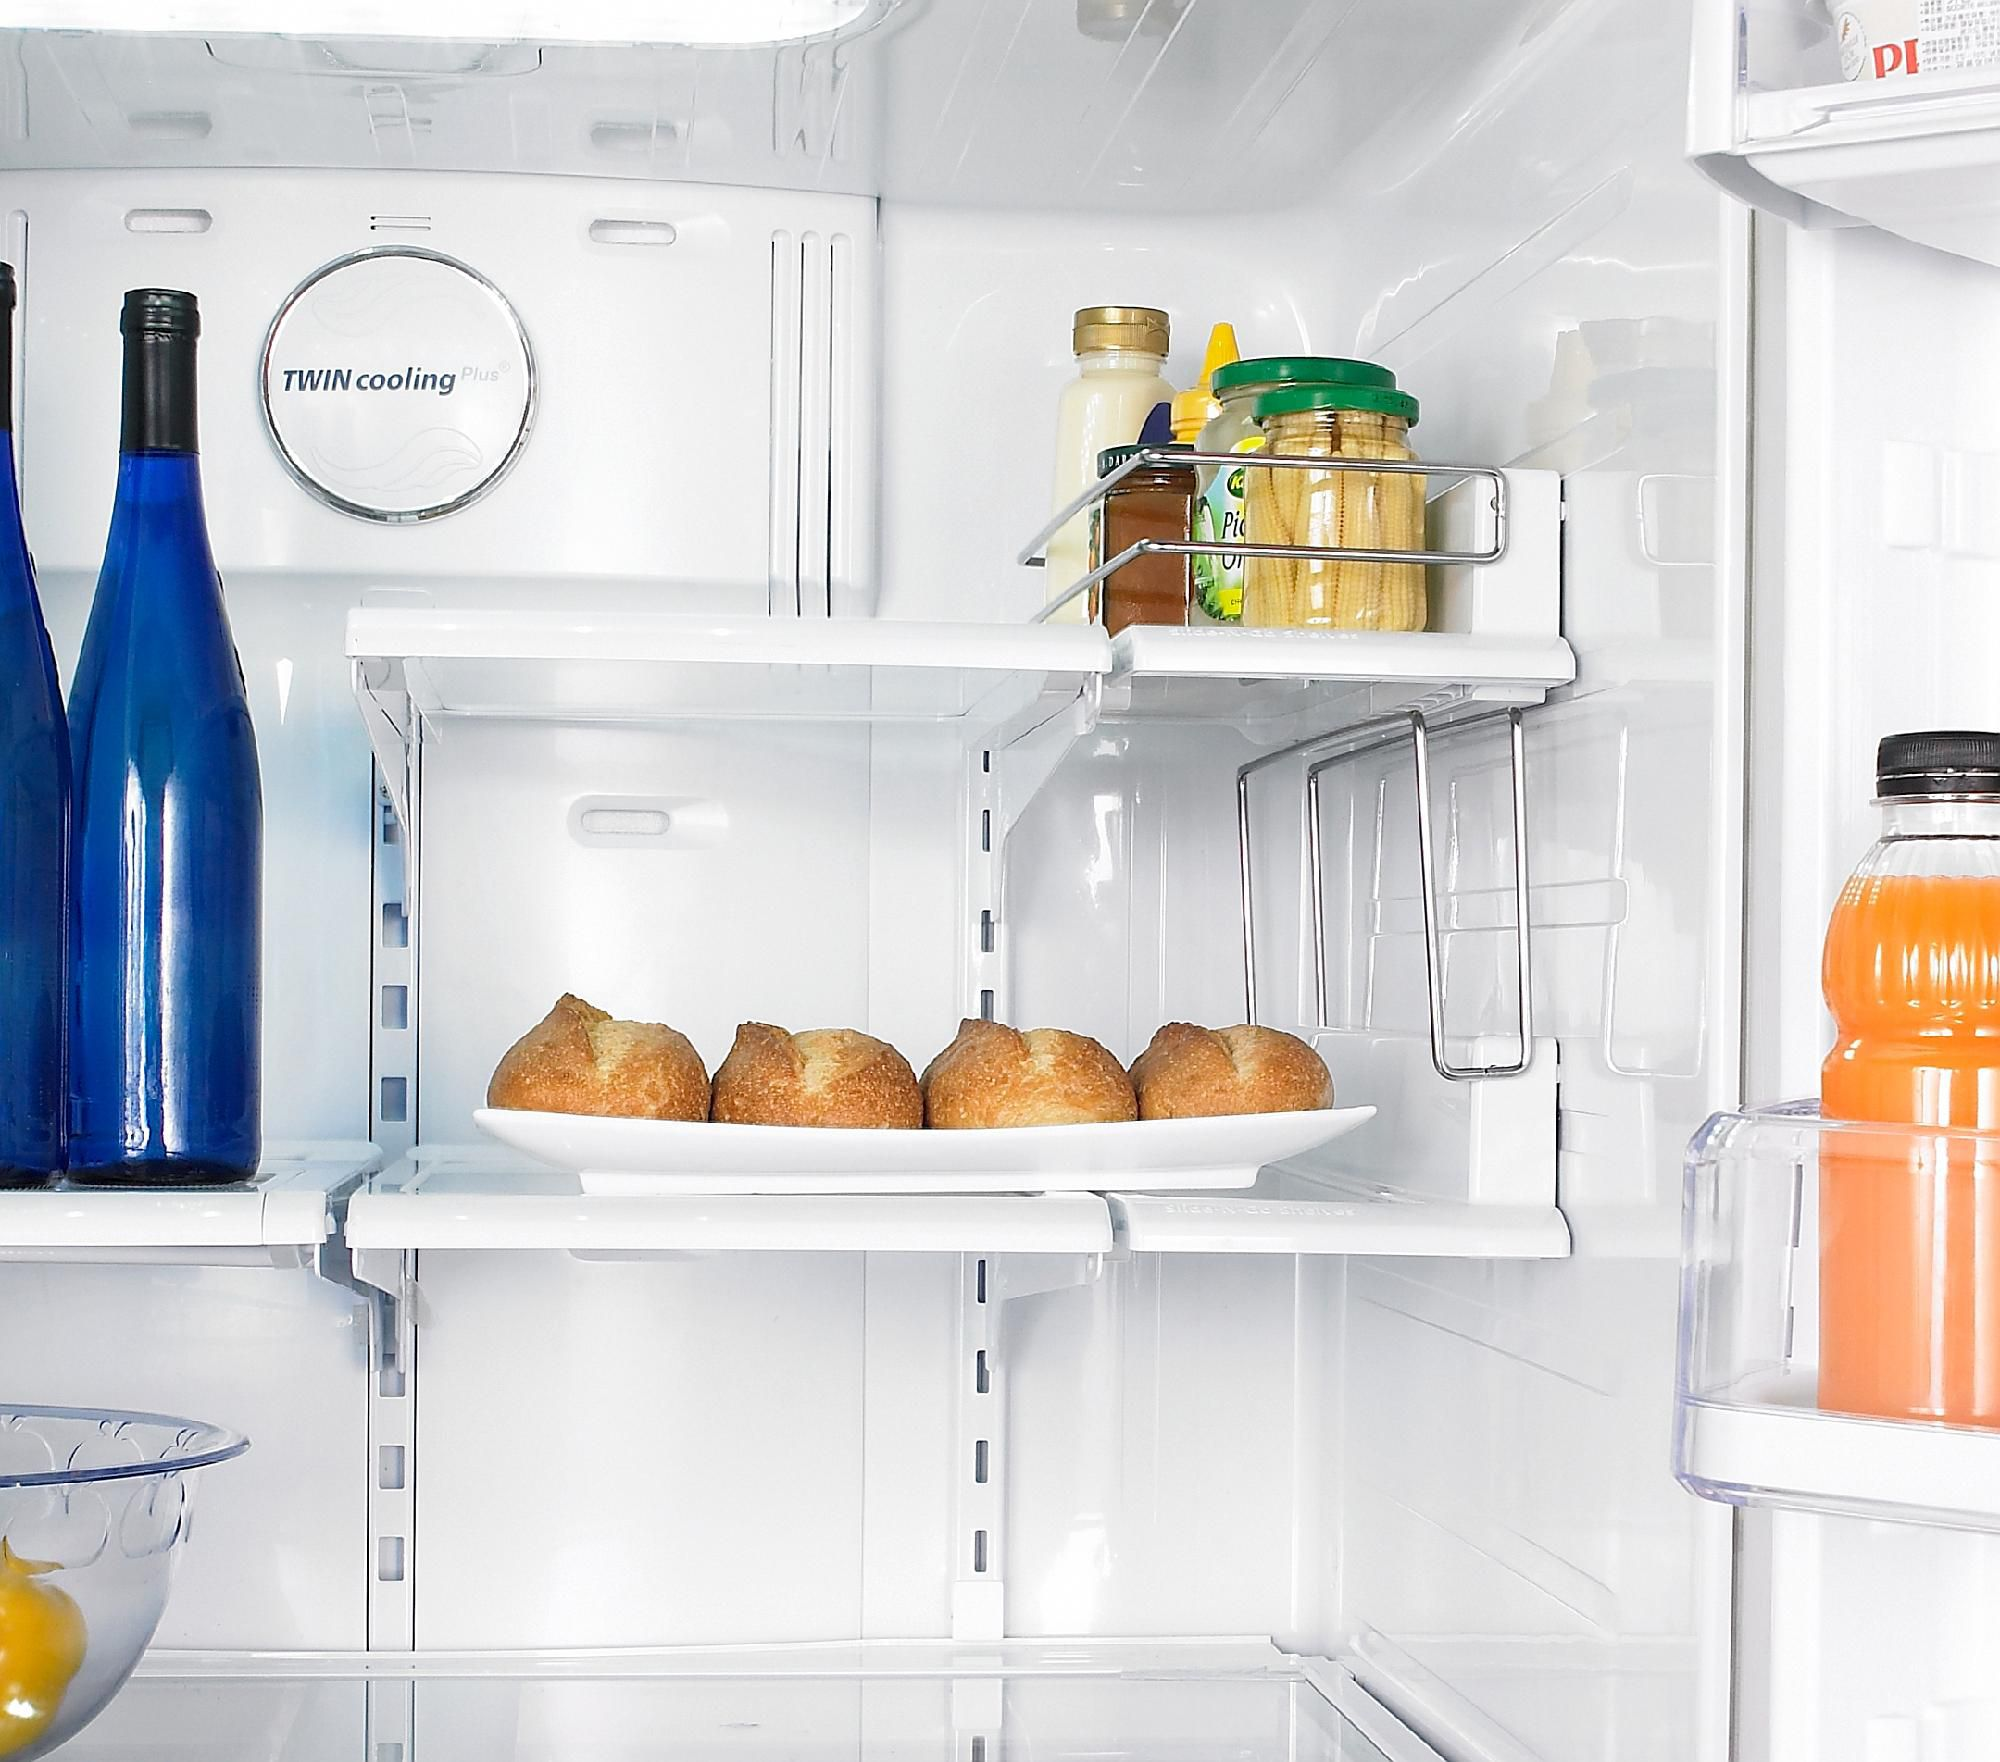 Samsung 29.0 cu. ft. French-Door Refrigerator